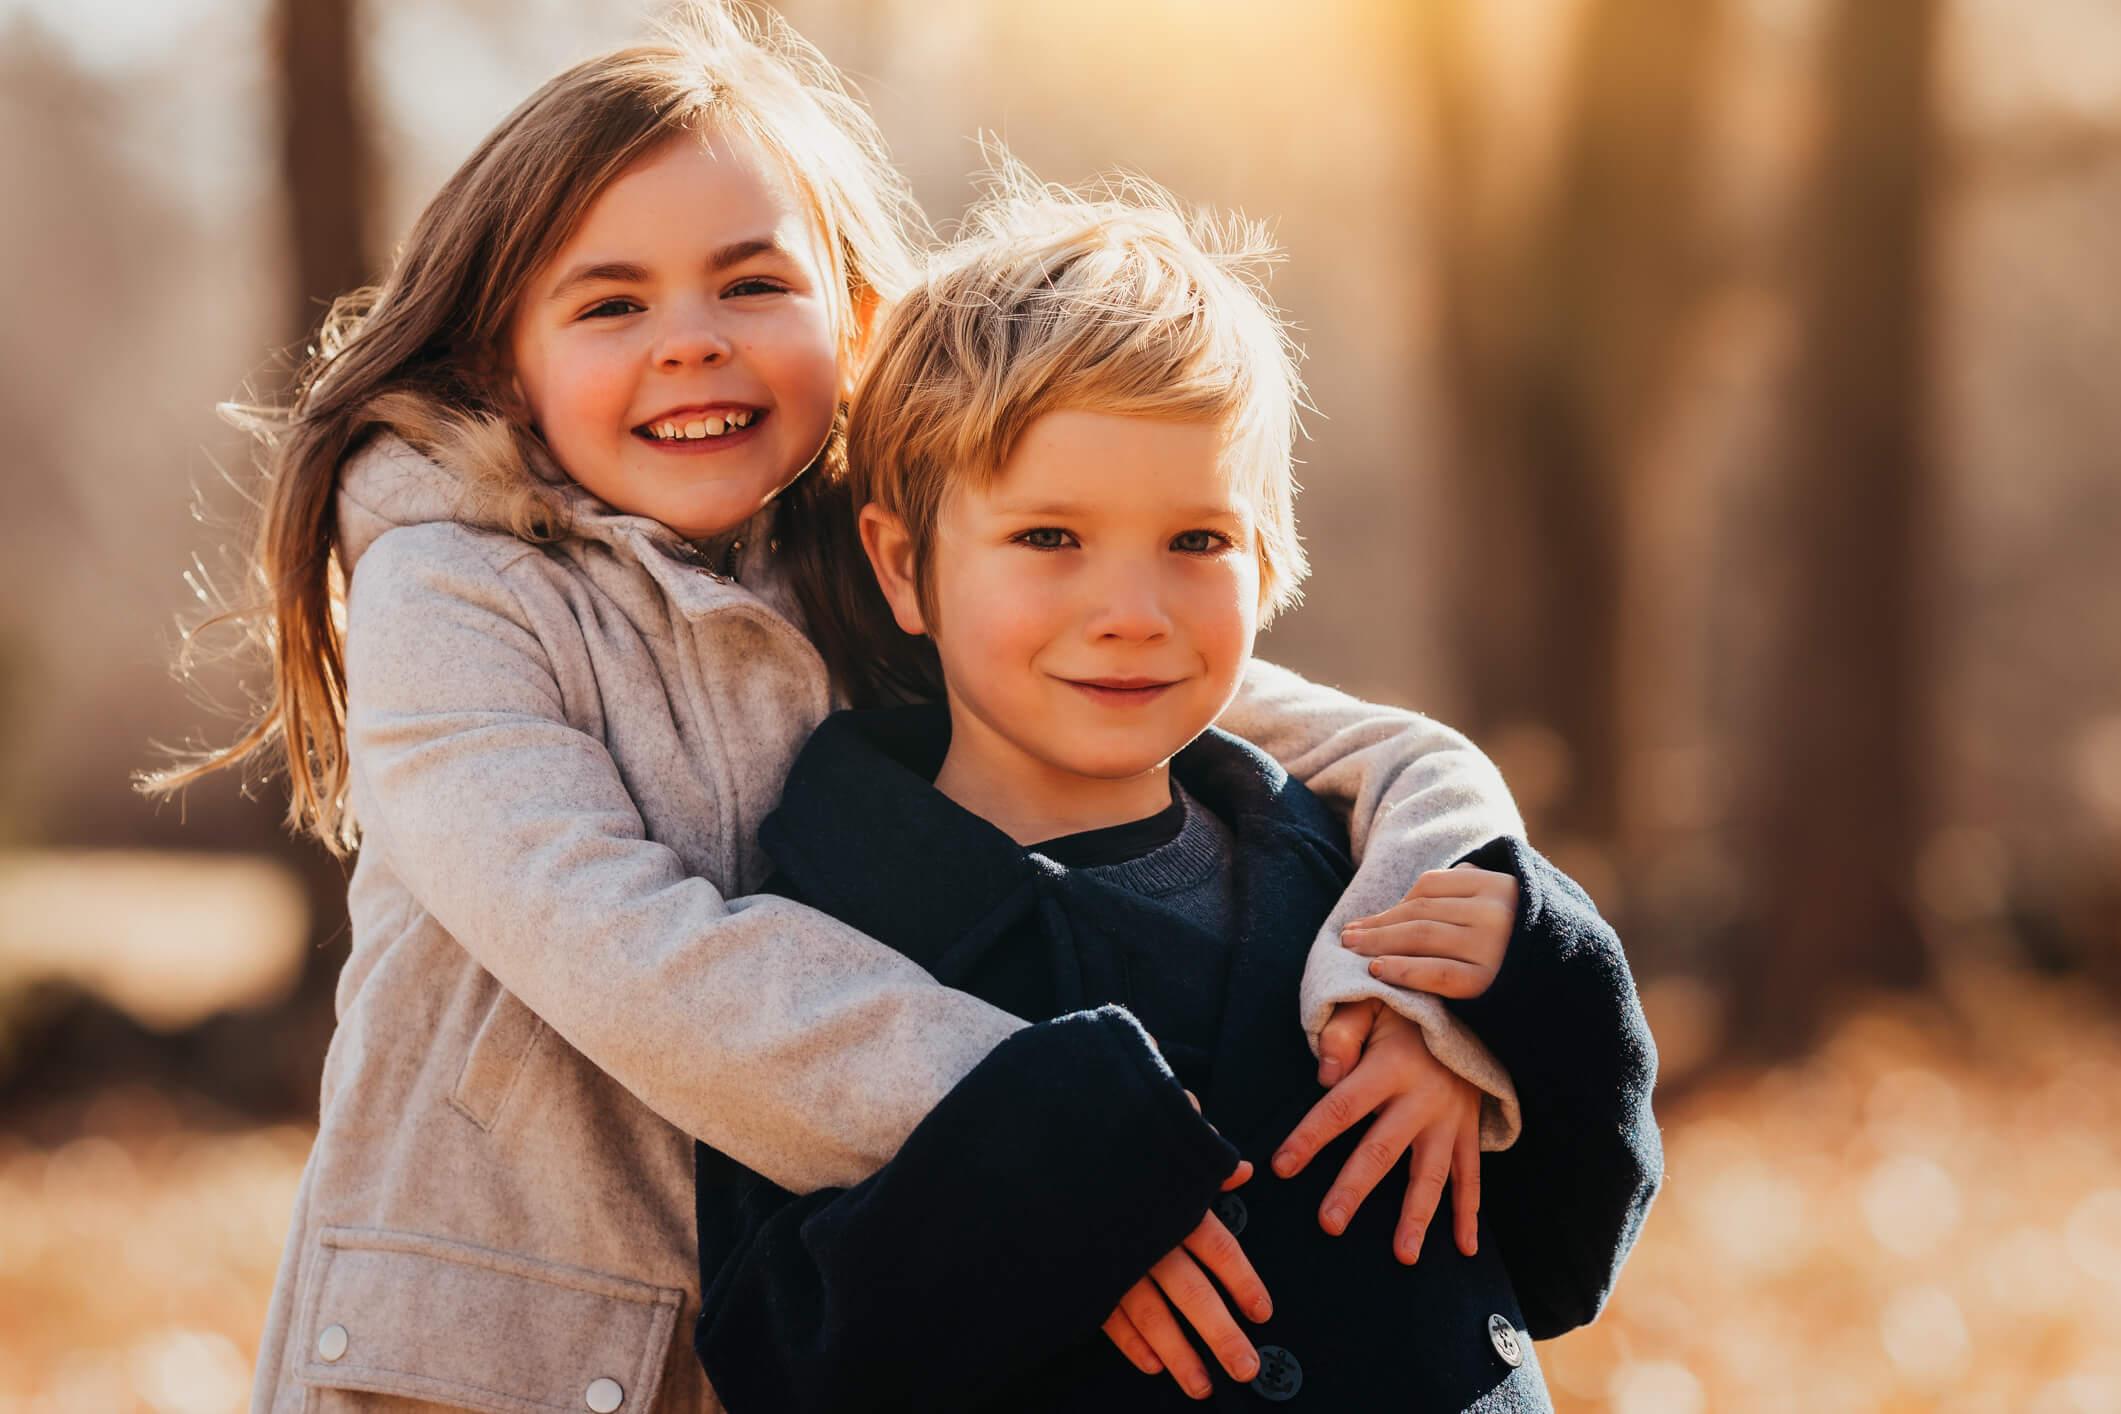 Fall Family Fine Art Portraits, Family Photographer Boston, siblings 8